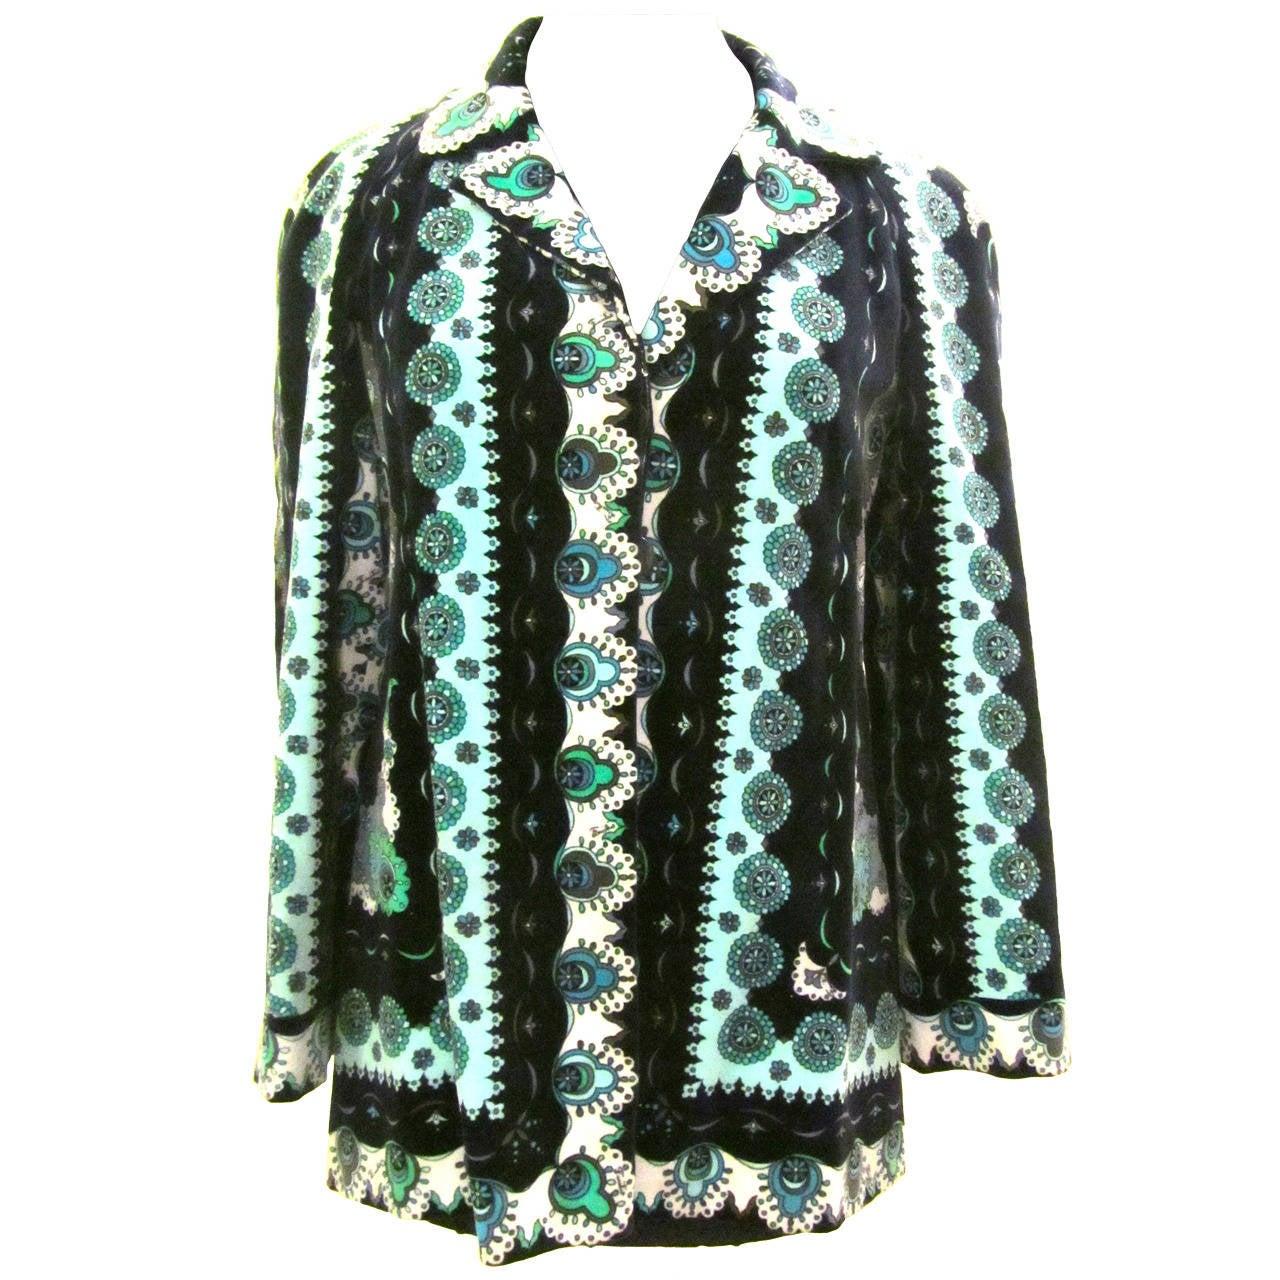 Emilio Pucci Printed Blue Velvet Jacket - 1960's